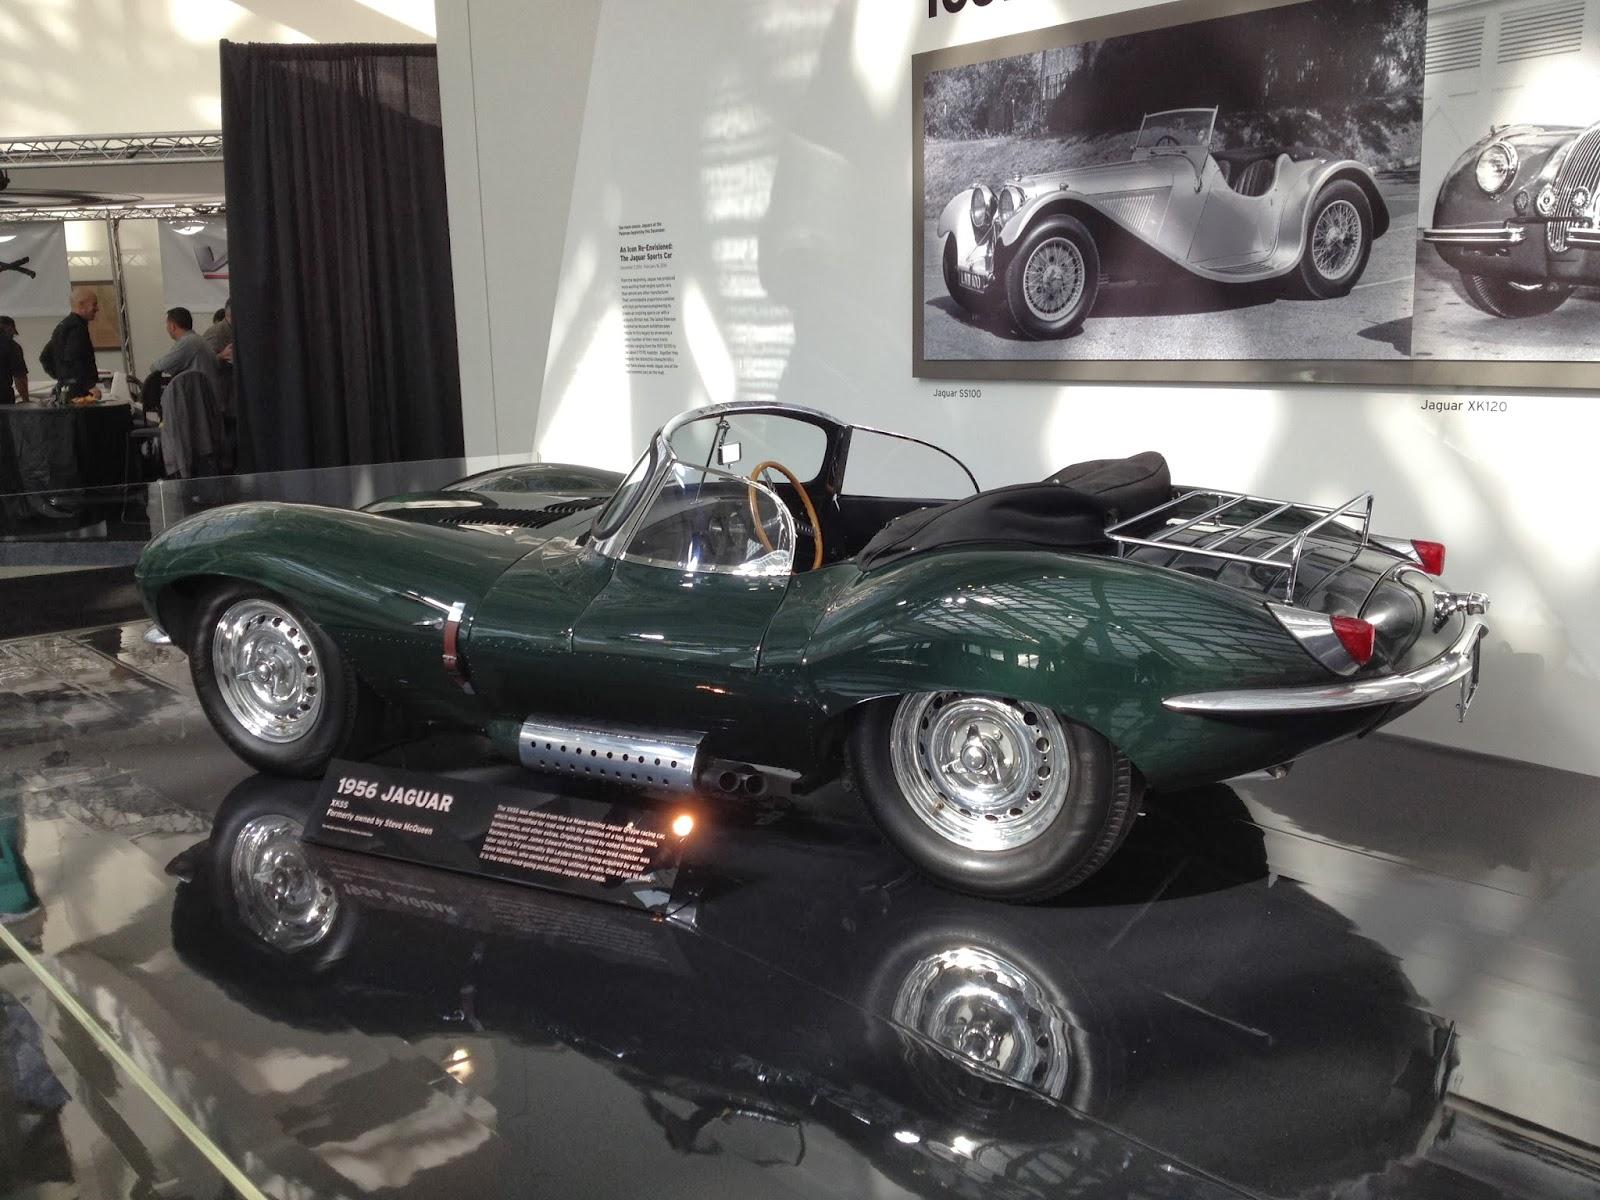 Carson's Car Pics: 1956 Jaguar XKSS